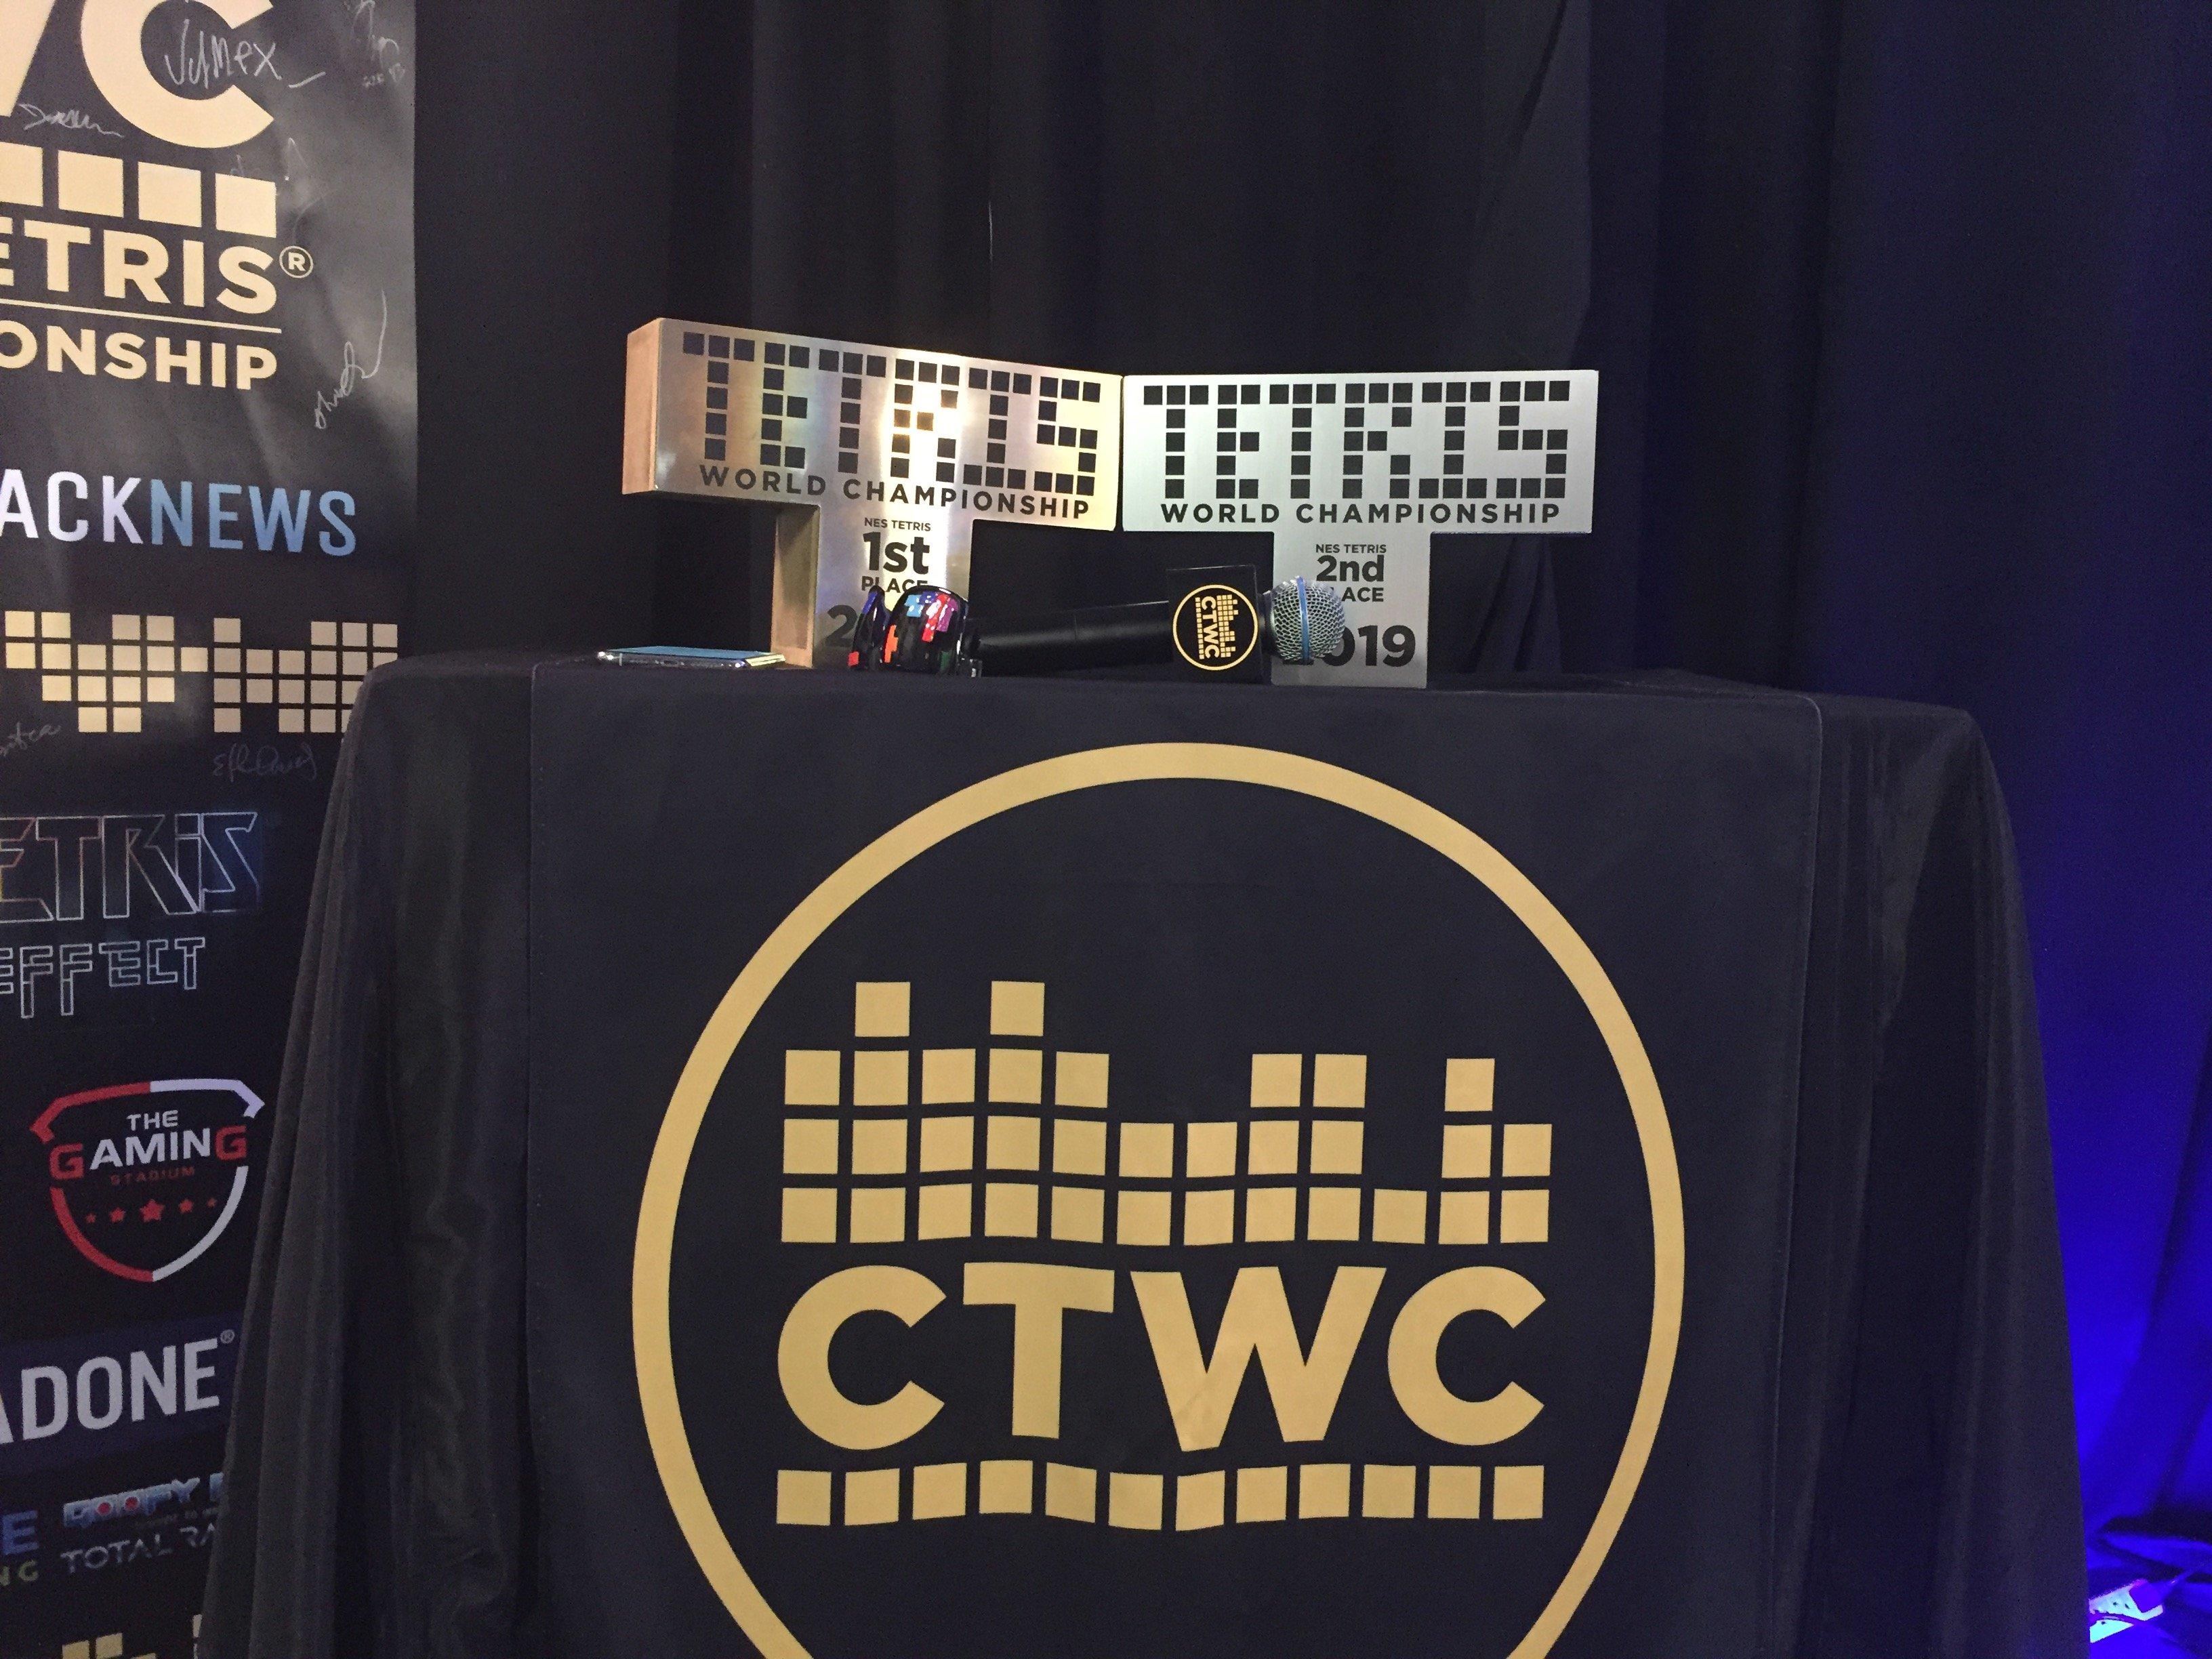 2019 Classic Tetris World Championship